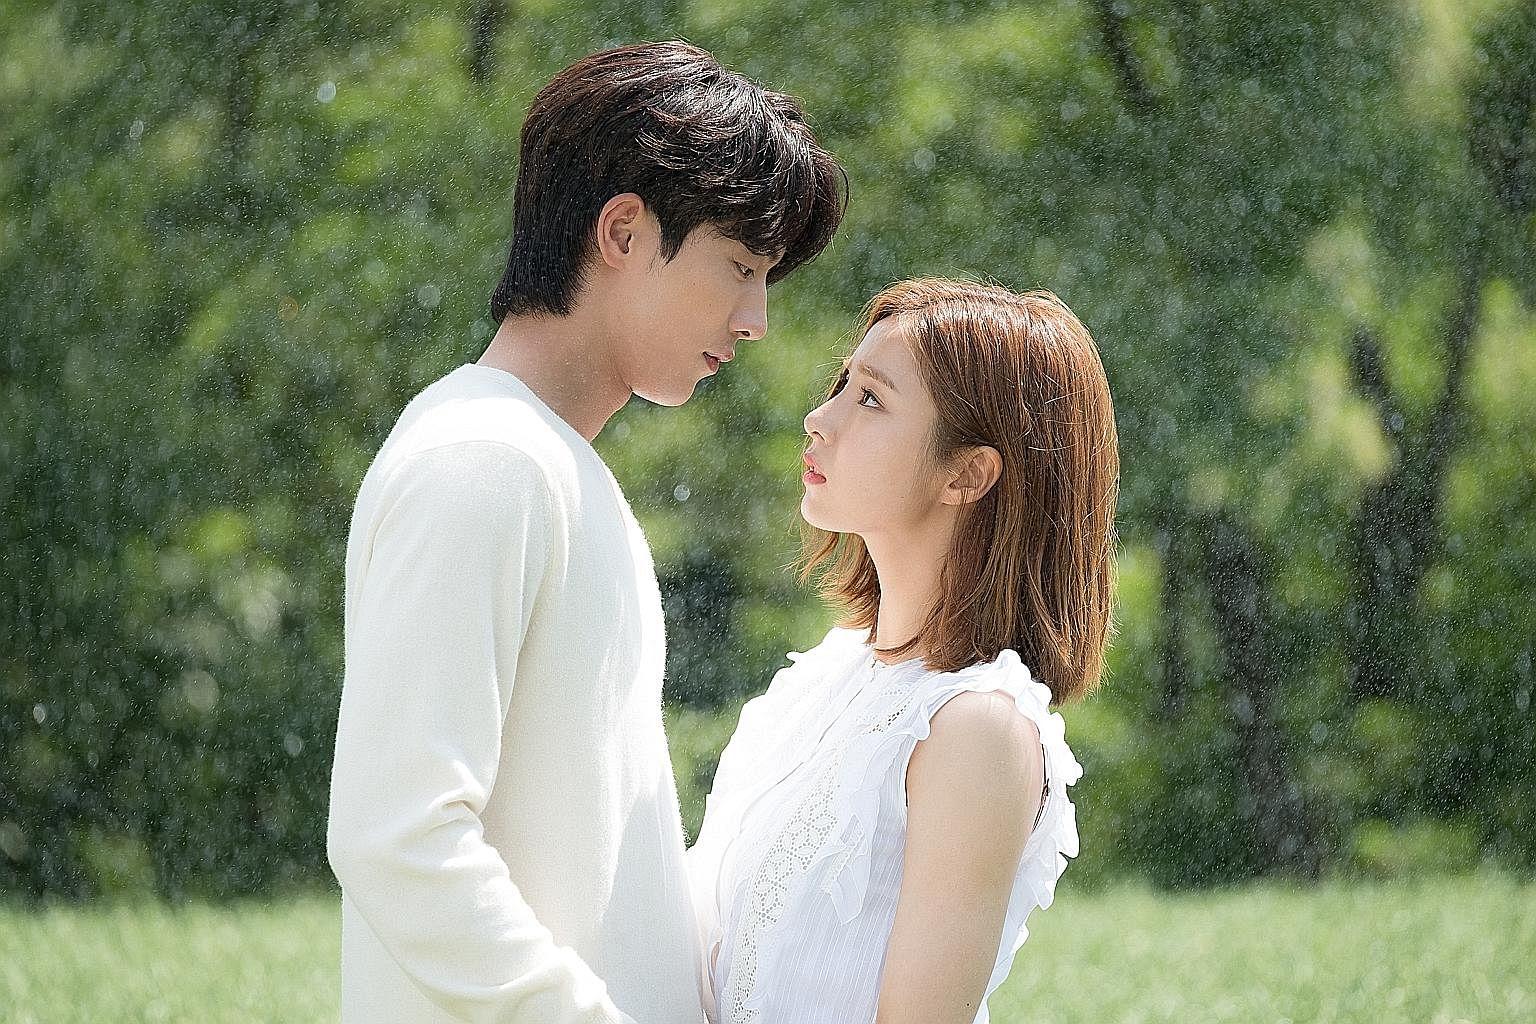 Nam Joo Hyuk (left) and Shin Sae Kyeong in The Bride Of Habaek.